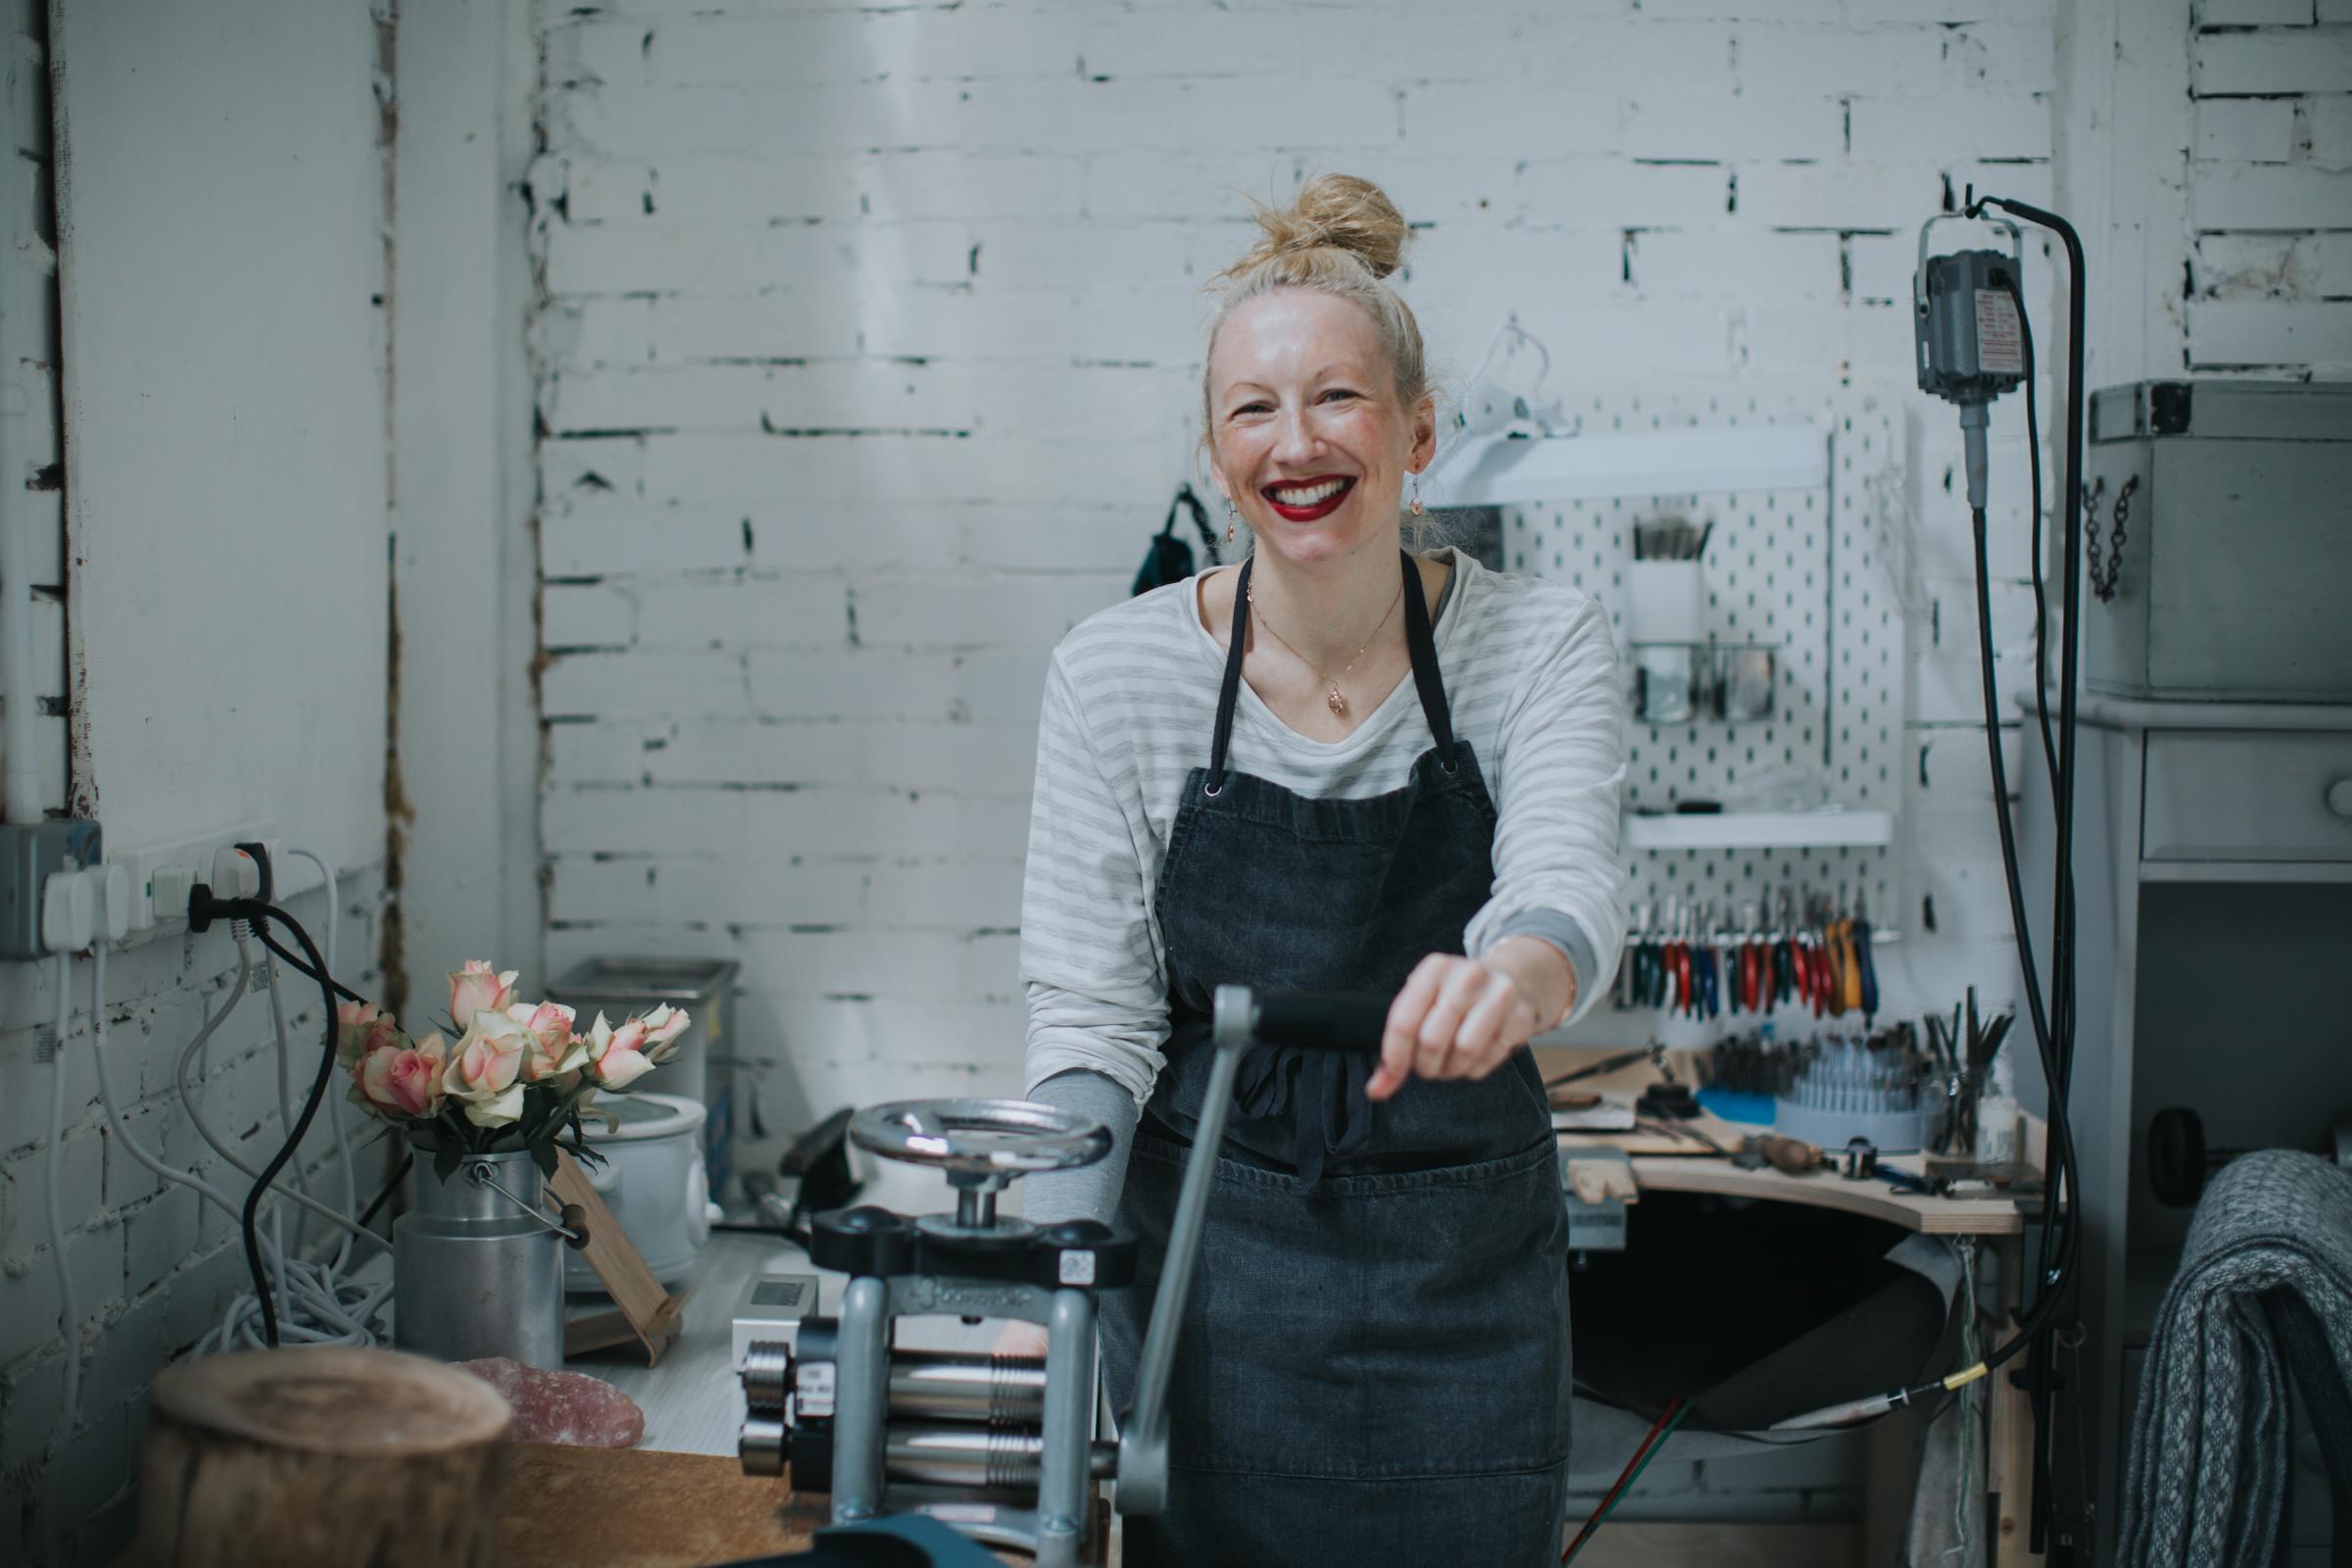 interview-jo-tootsievalentine-fine-designer-jewellery-fair-trade-gold-minas-planet-jasmina-haskovic-london-uk28.jpg